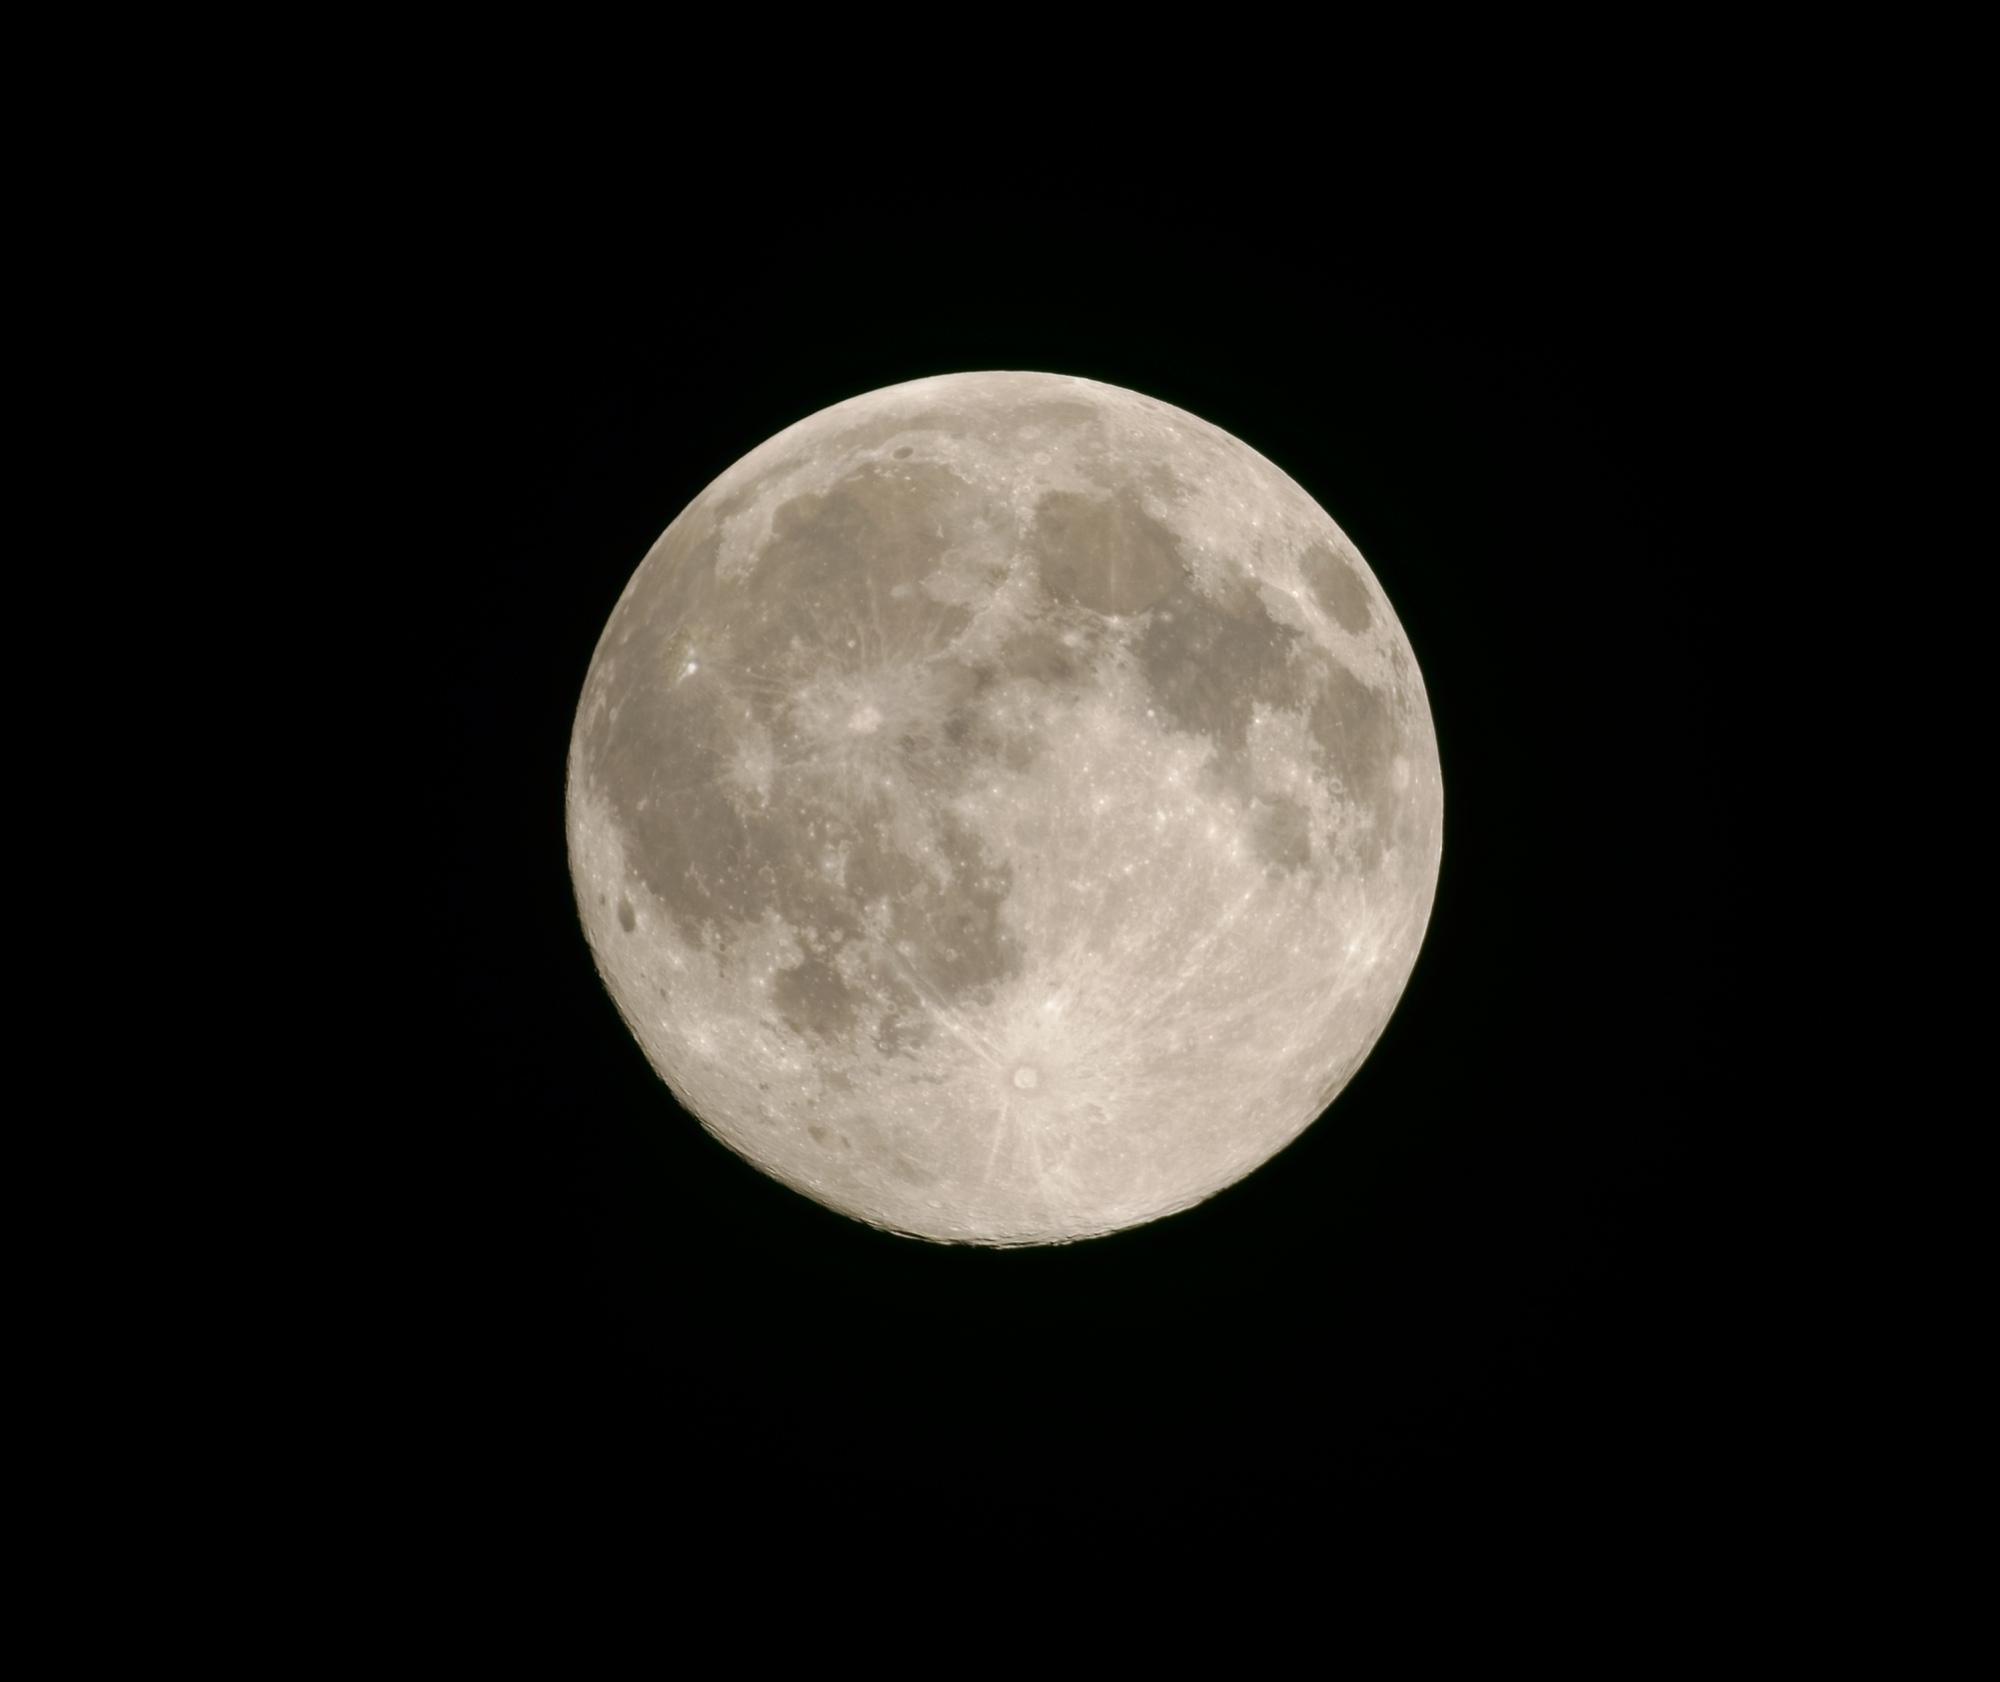 603bd9b6eb79a_lune270221(T600-doubleur-100).thumb.jpg.b644c11fafe3e19b9b144a78d778f577.jpg